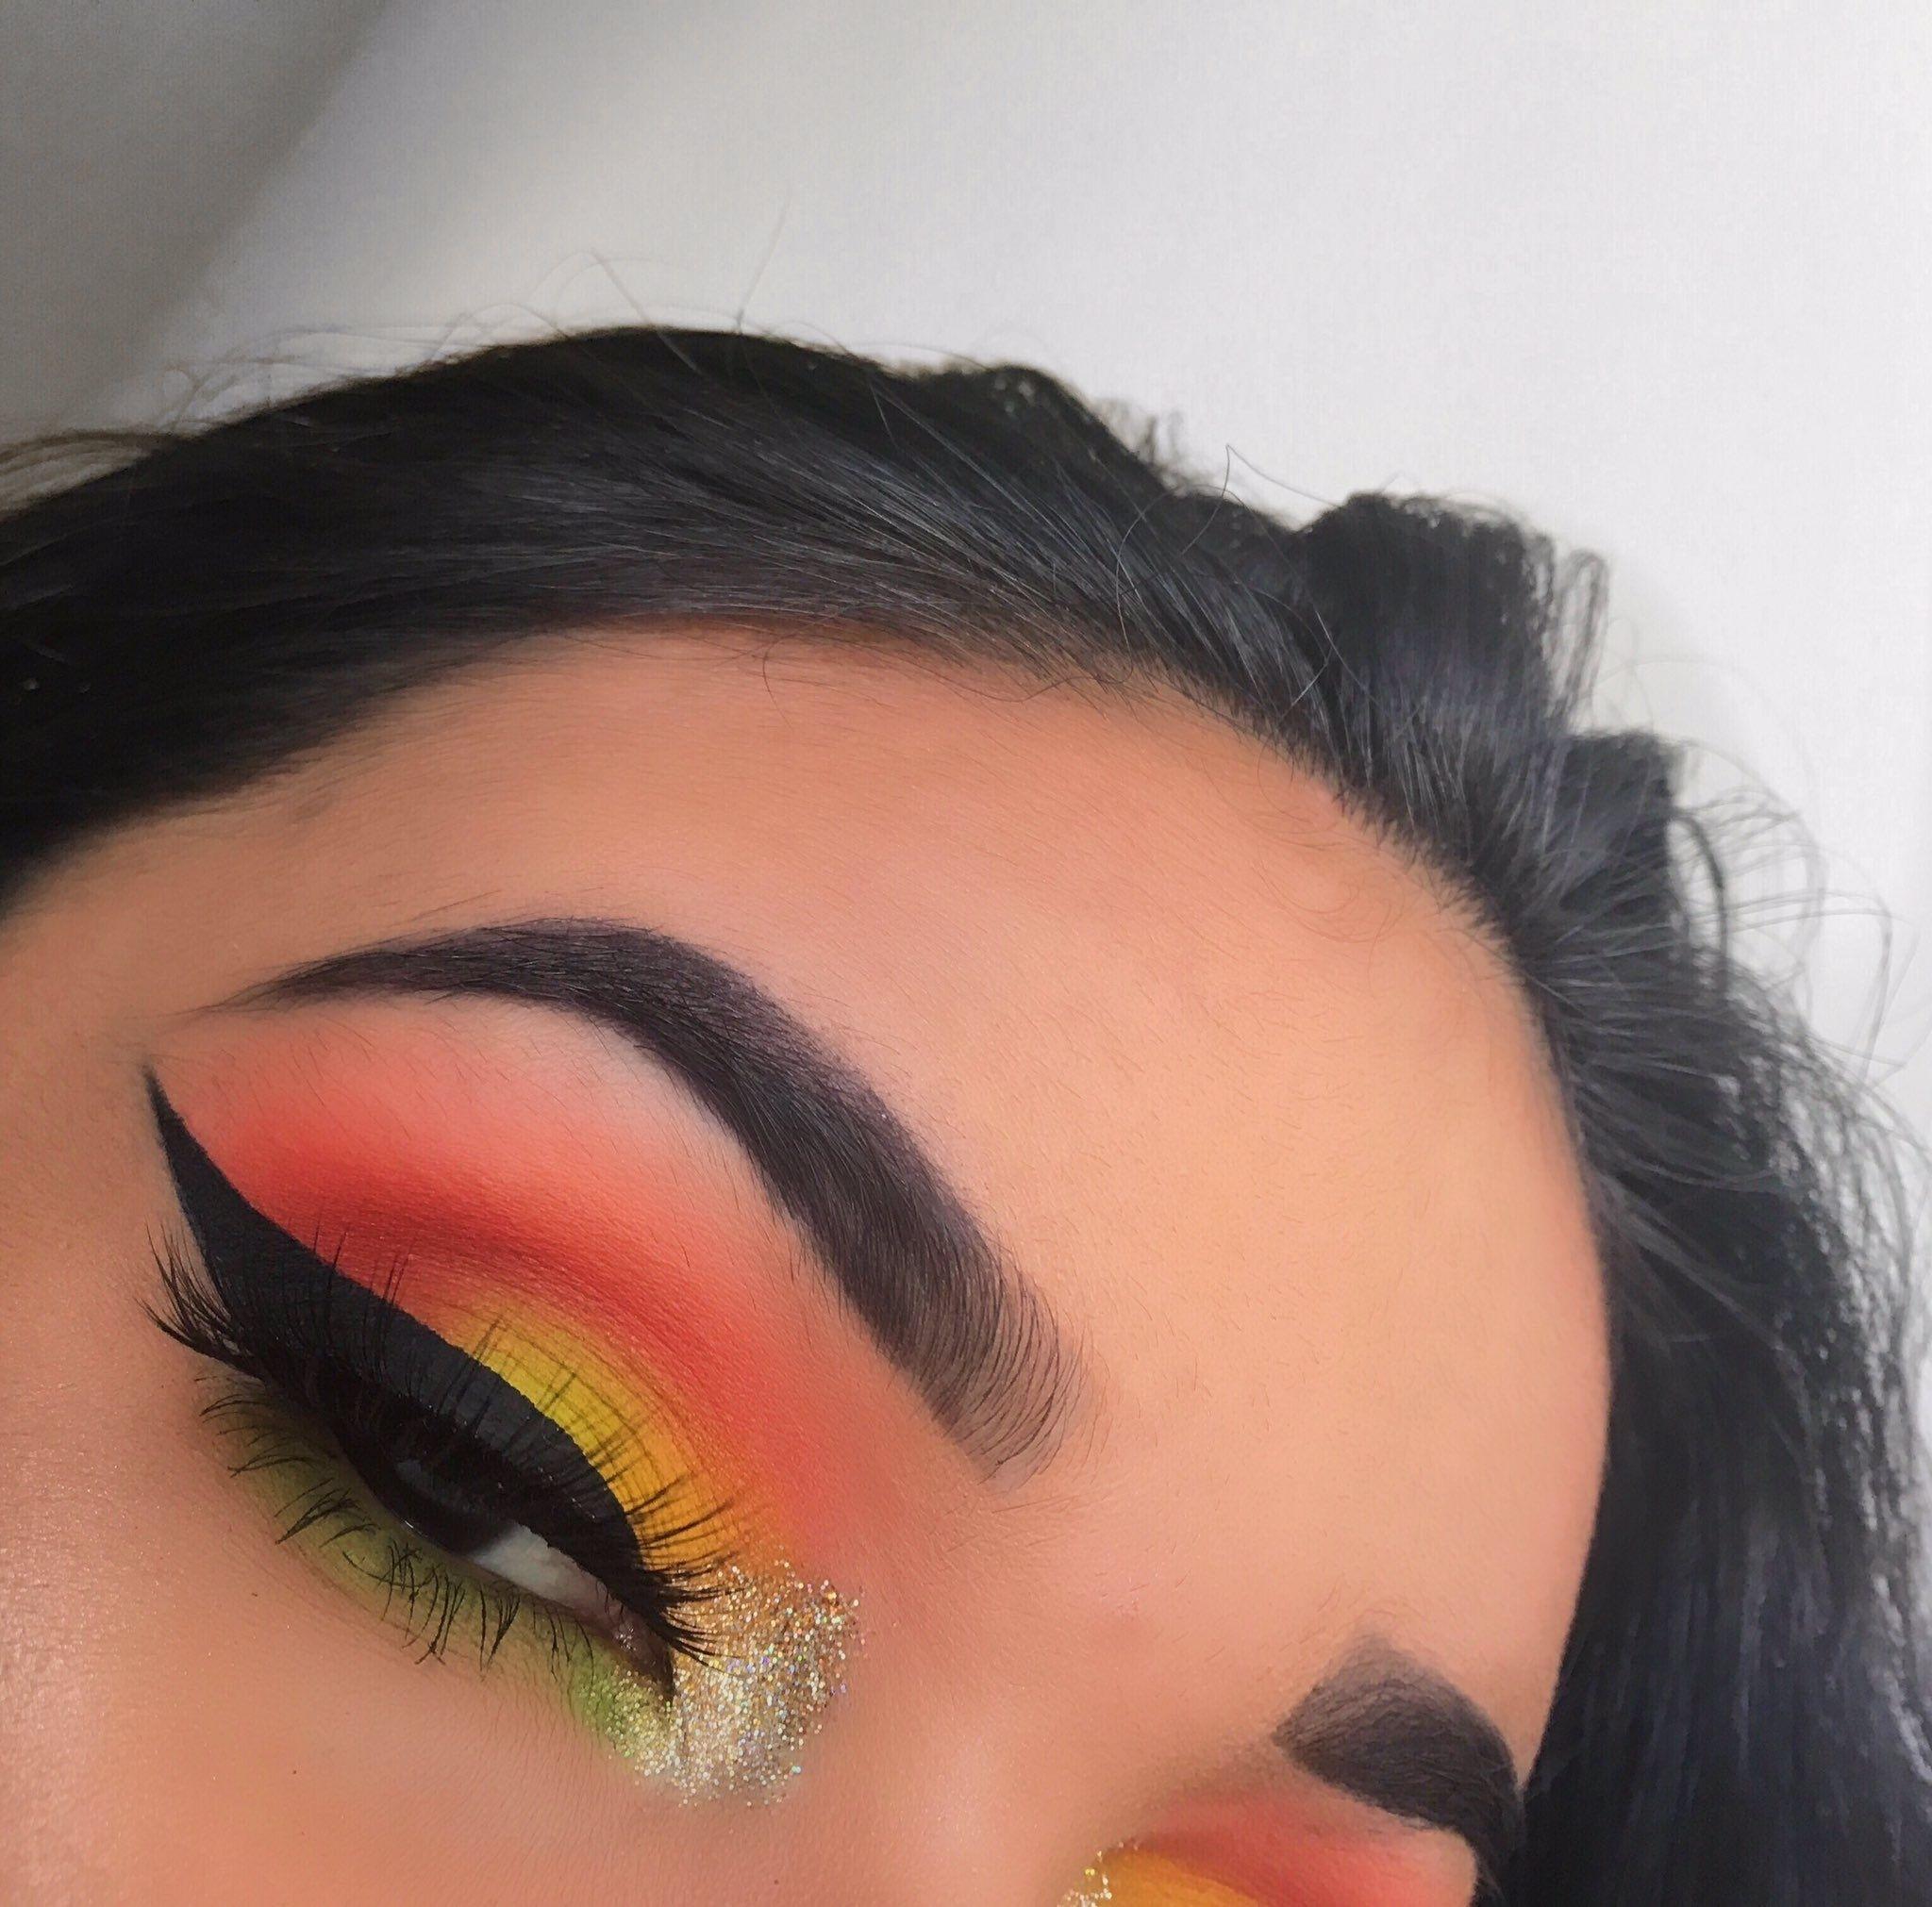 eye makeup designs tumblr - wavy haircut